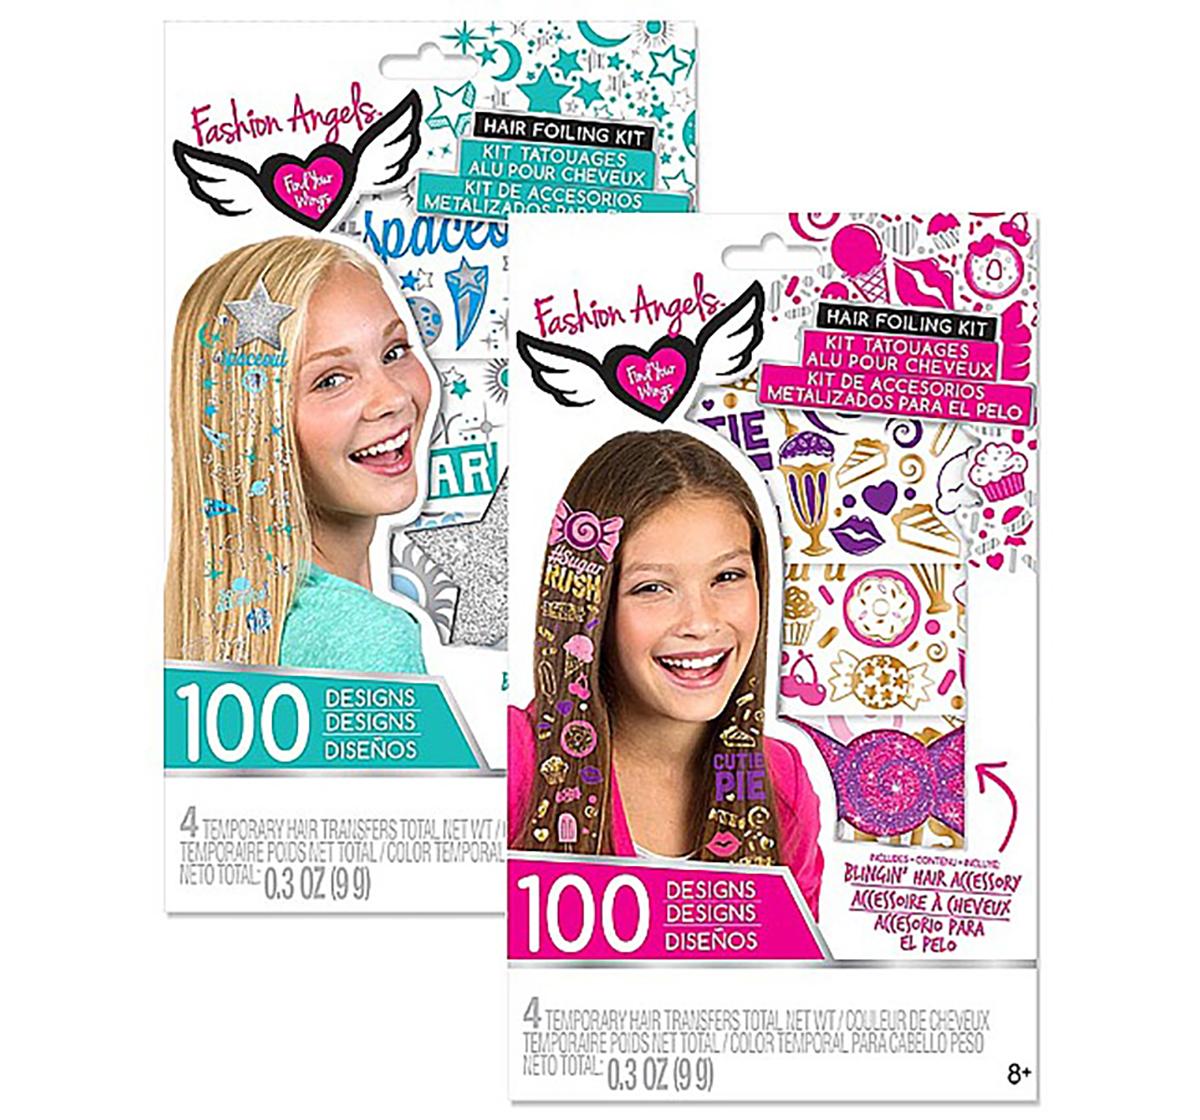 Fashion Angels | Fashion Angels Hair Foiling Assorted DIY Art & Craft Kits for Girls age 8Y+